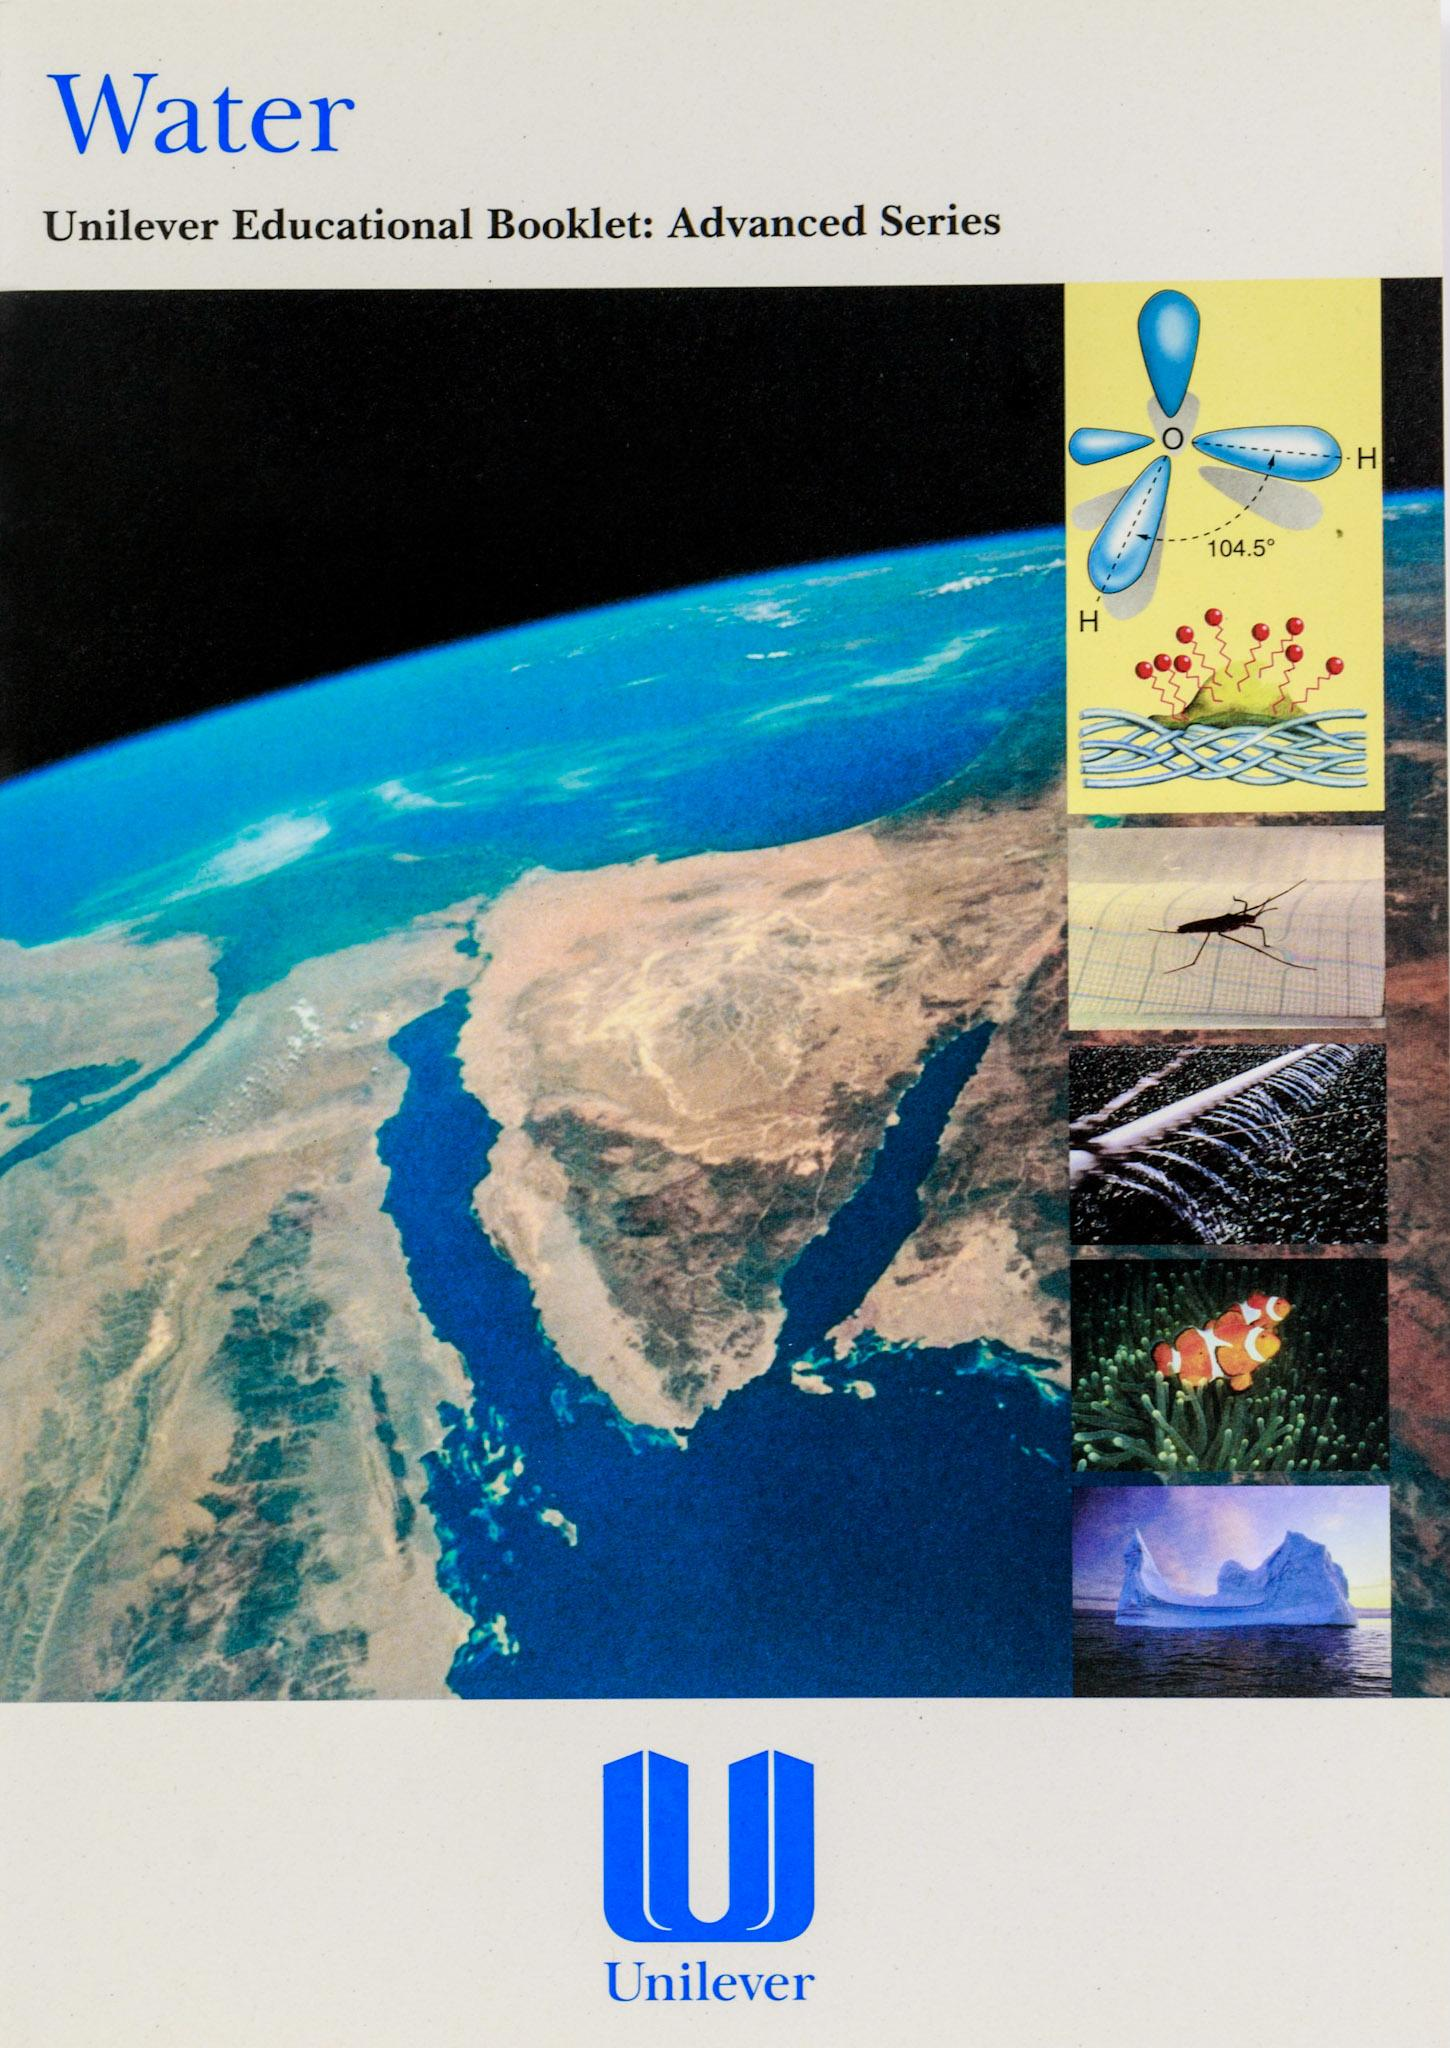 Water: Unilever Educational Booklet